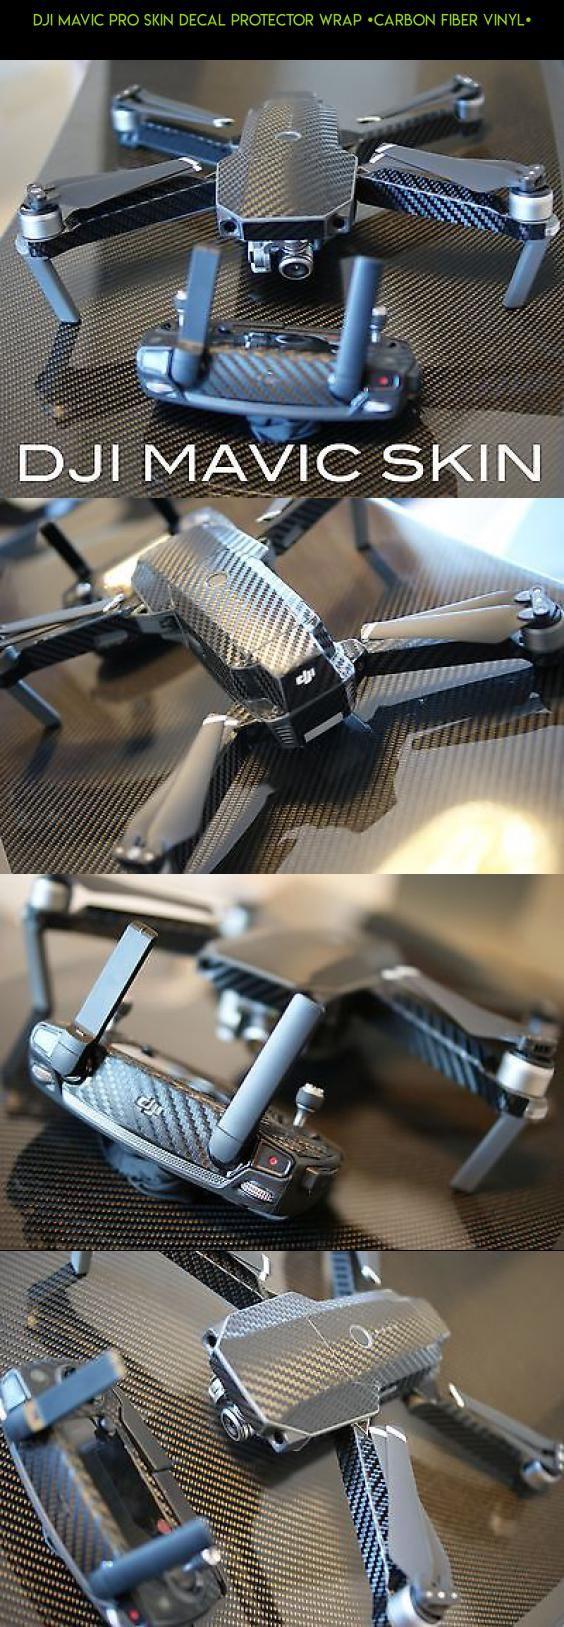 DJI Mavic Pro Skin decal protector wrap [Carbon Fiber Vinyl] #shopping #tech #kit #vinyl #parts #fpv #drone #technology #camera #gadgets #mavic #plans #racing #products #pro